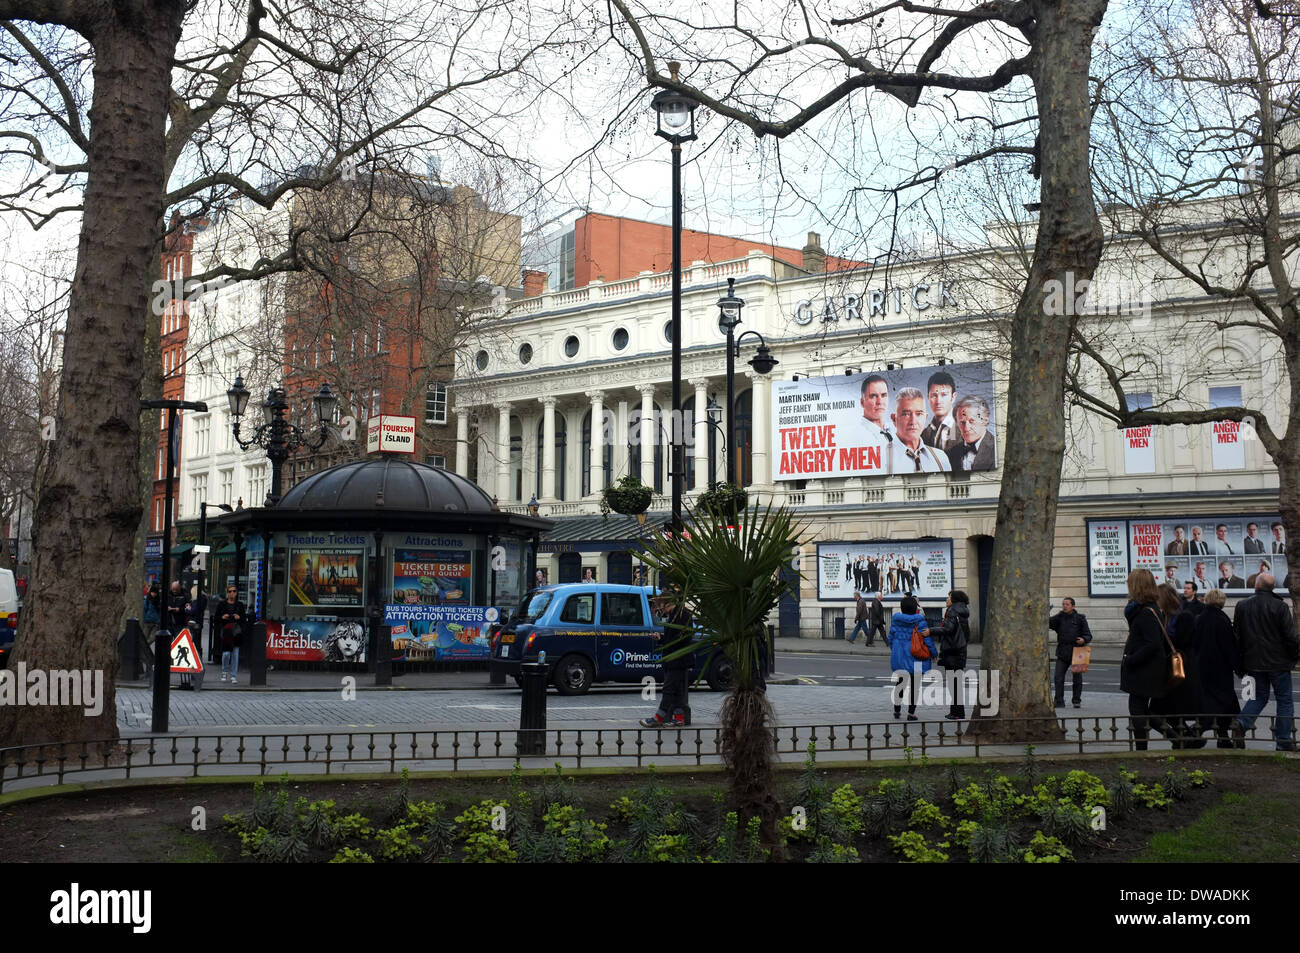 garrick theatre charing cross road  london wc2 uk 2014 - Stock Image